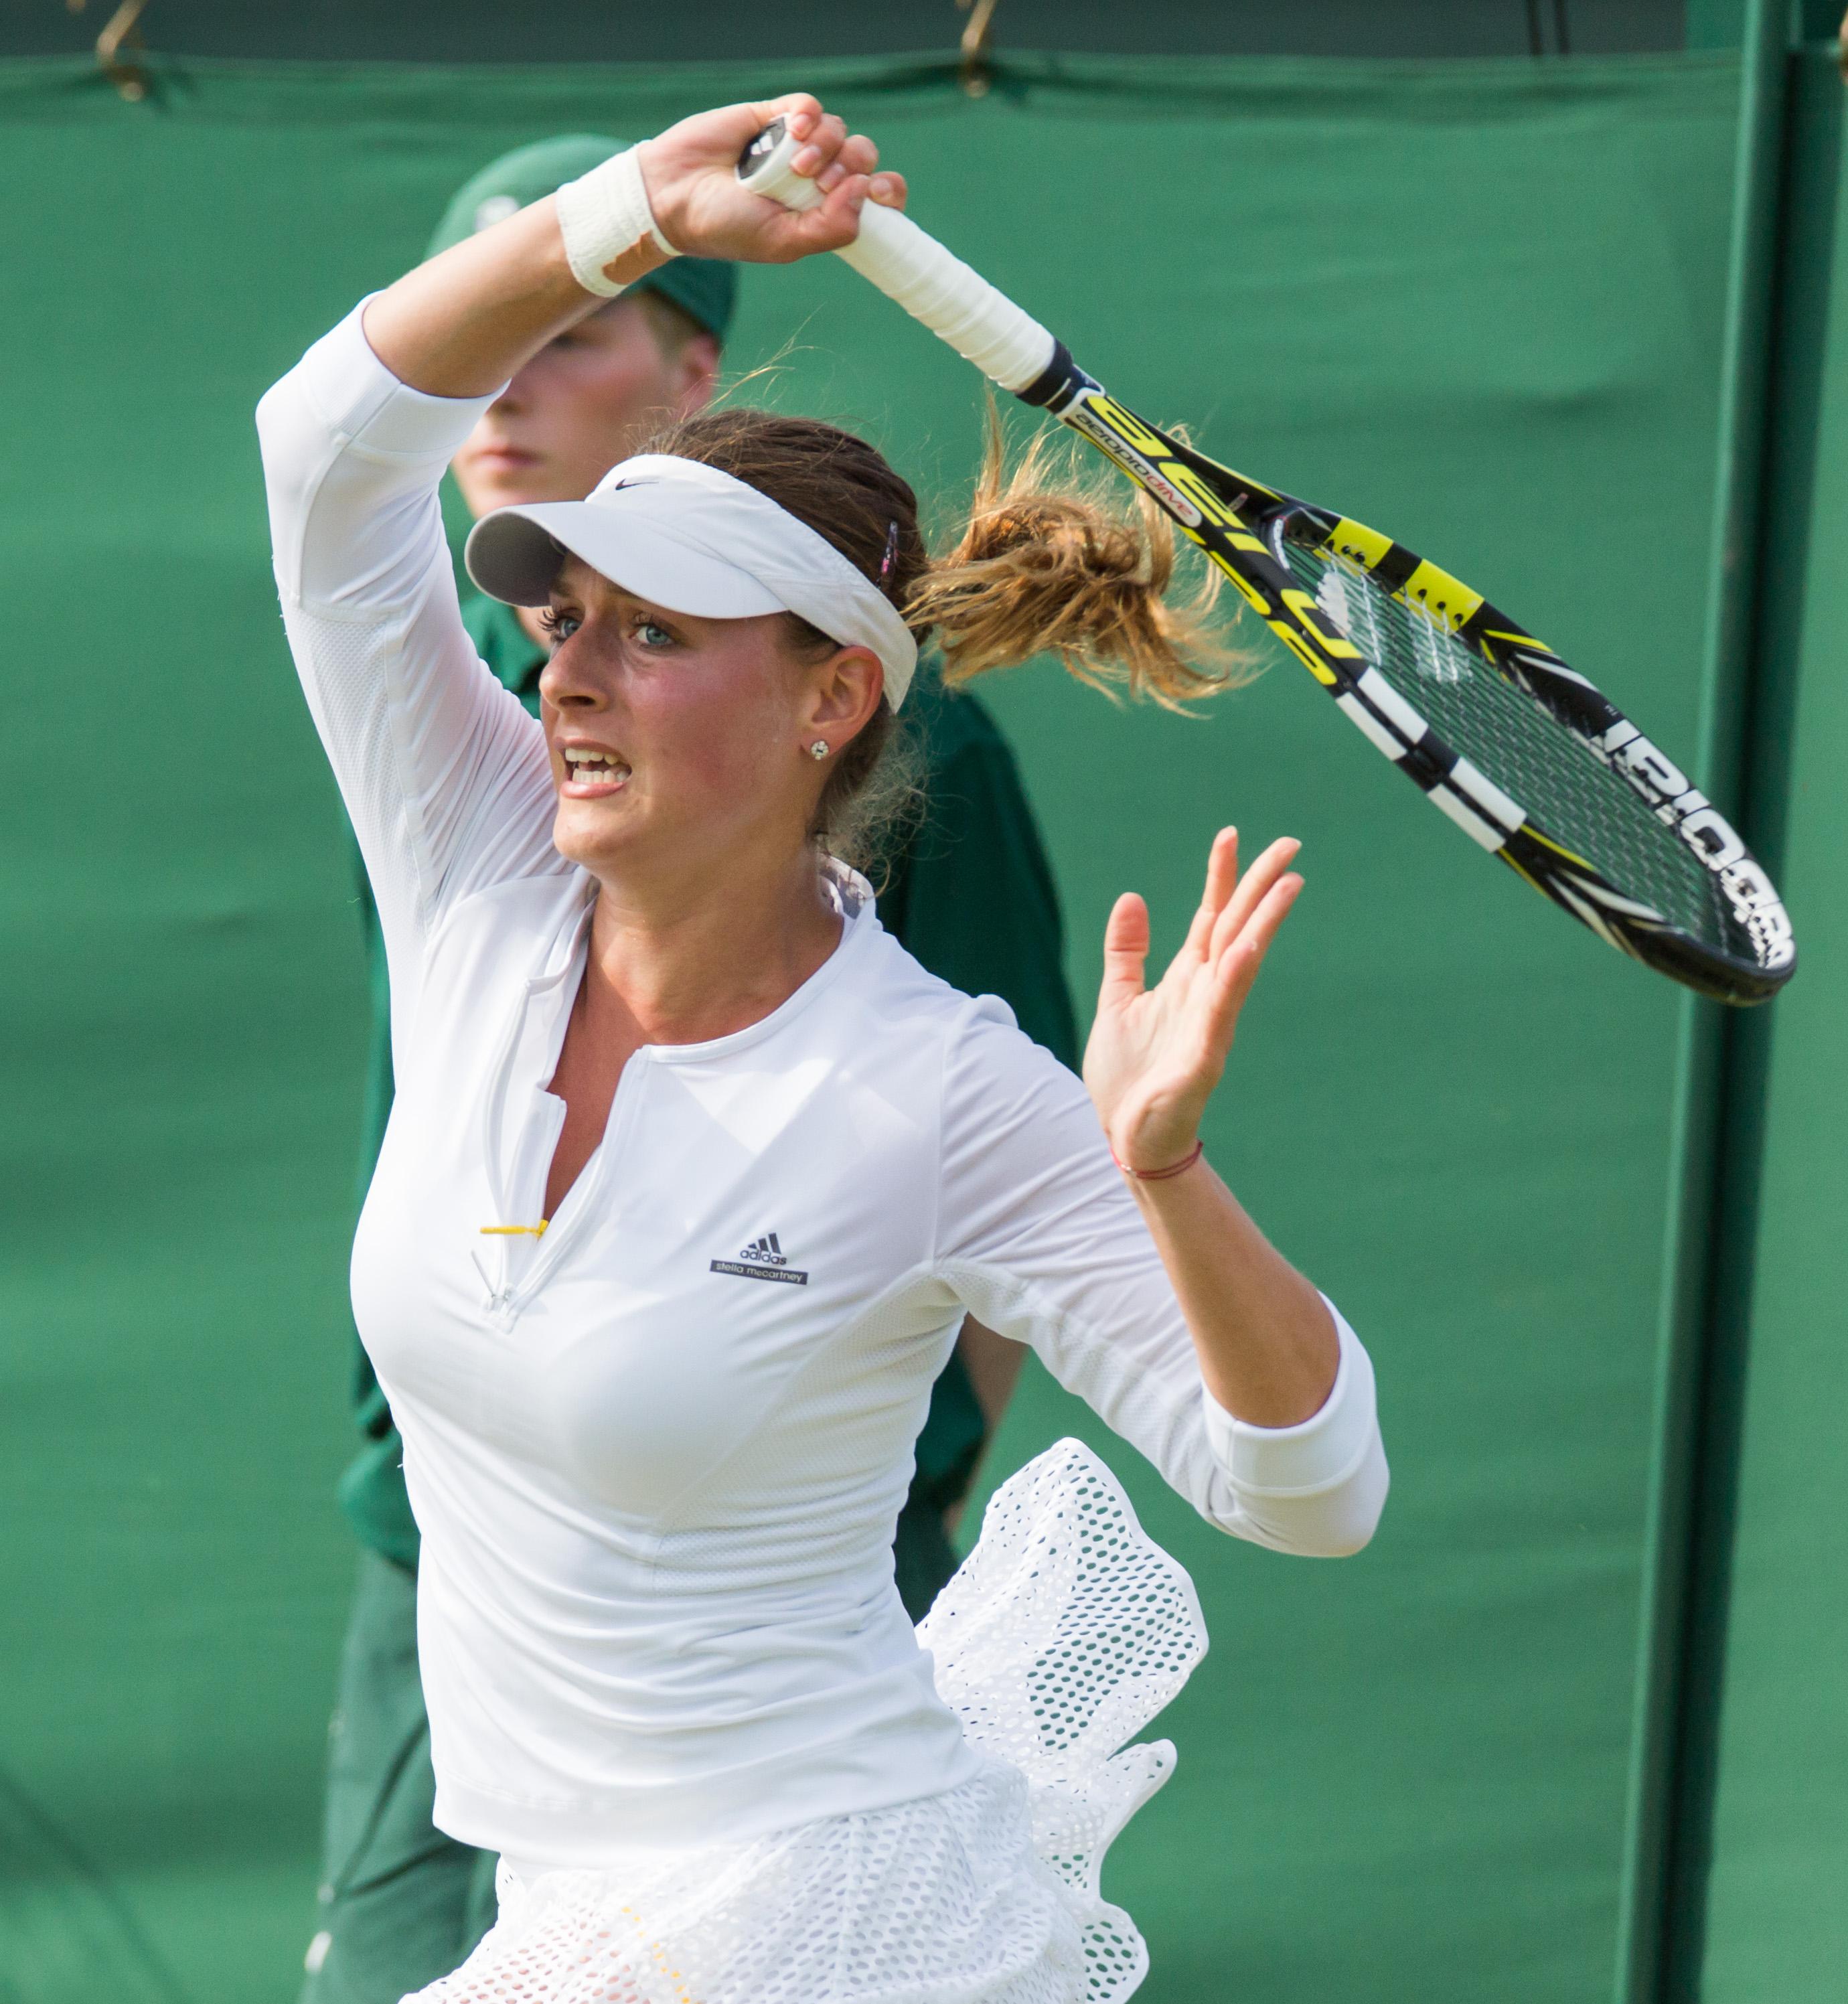 File:Ana Bogdan 1, 2015 Wimbledon Qualifying - Diliff.jpg - Wikimedia Commons